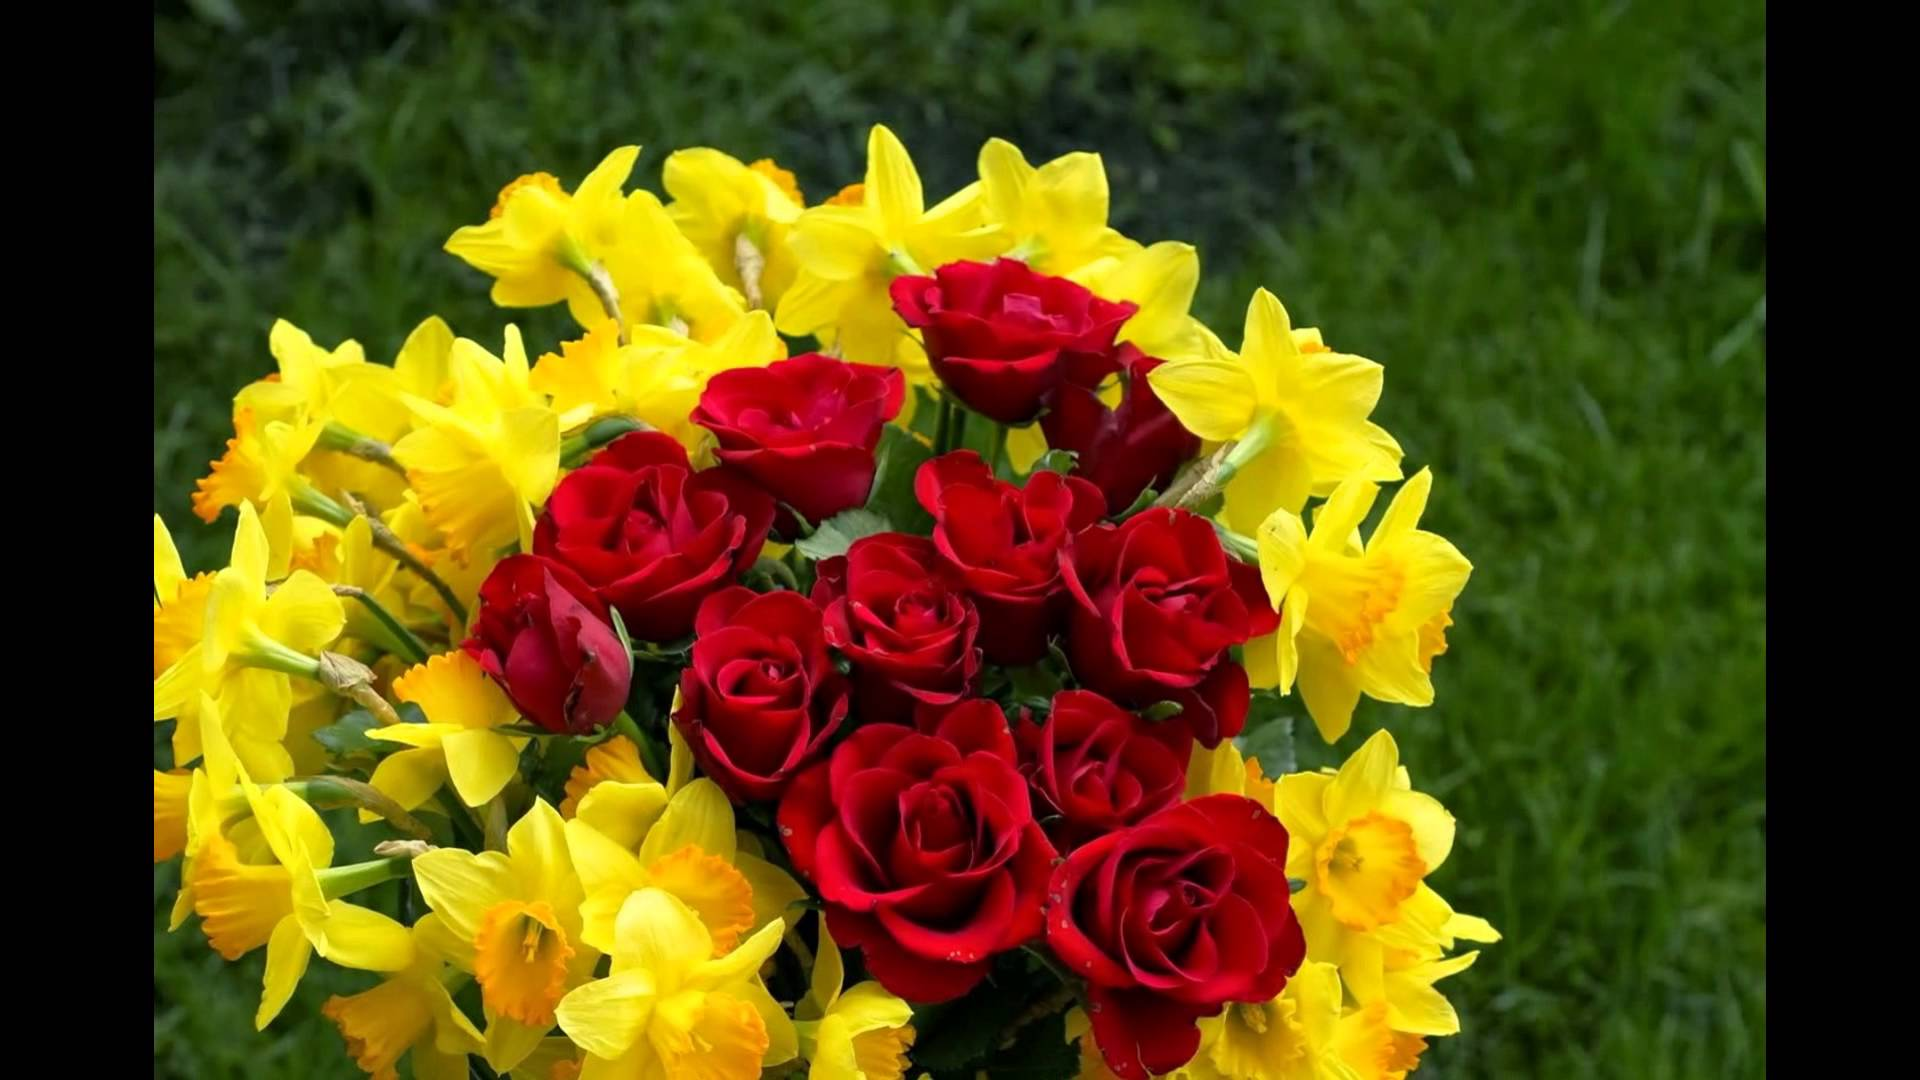 بالصور احلى صور ورد , صور اجمل الورود 3232 6